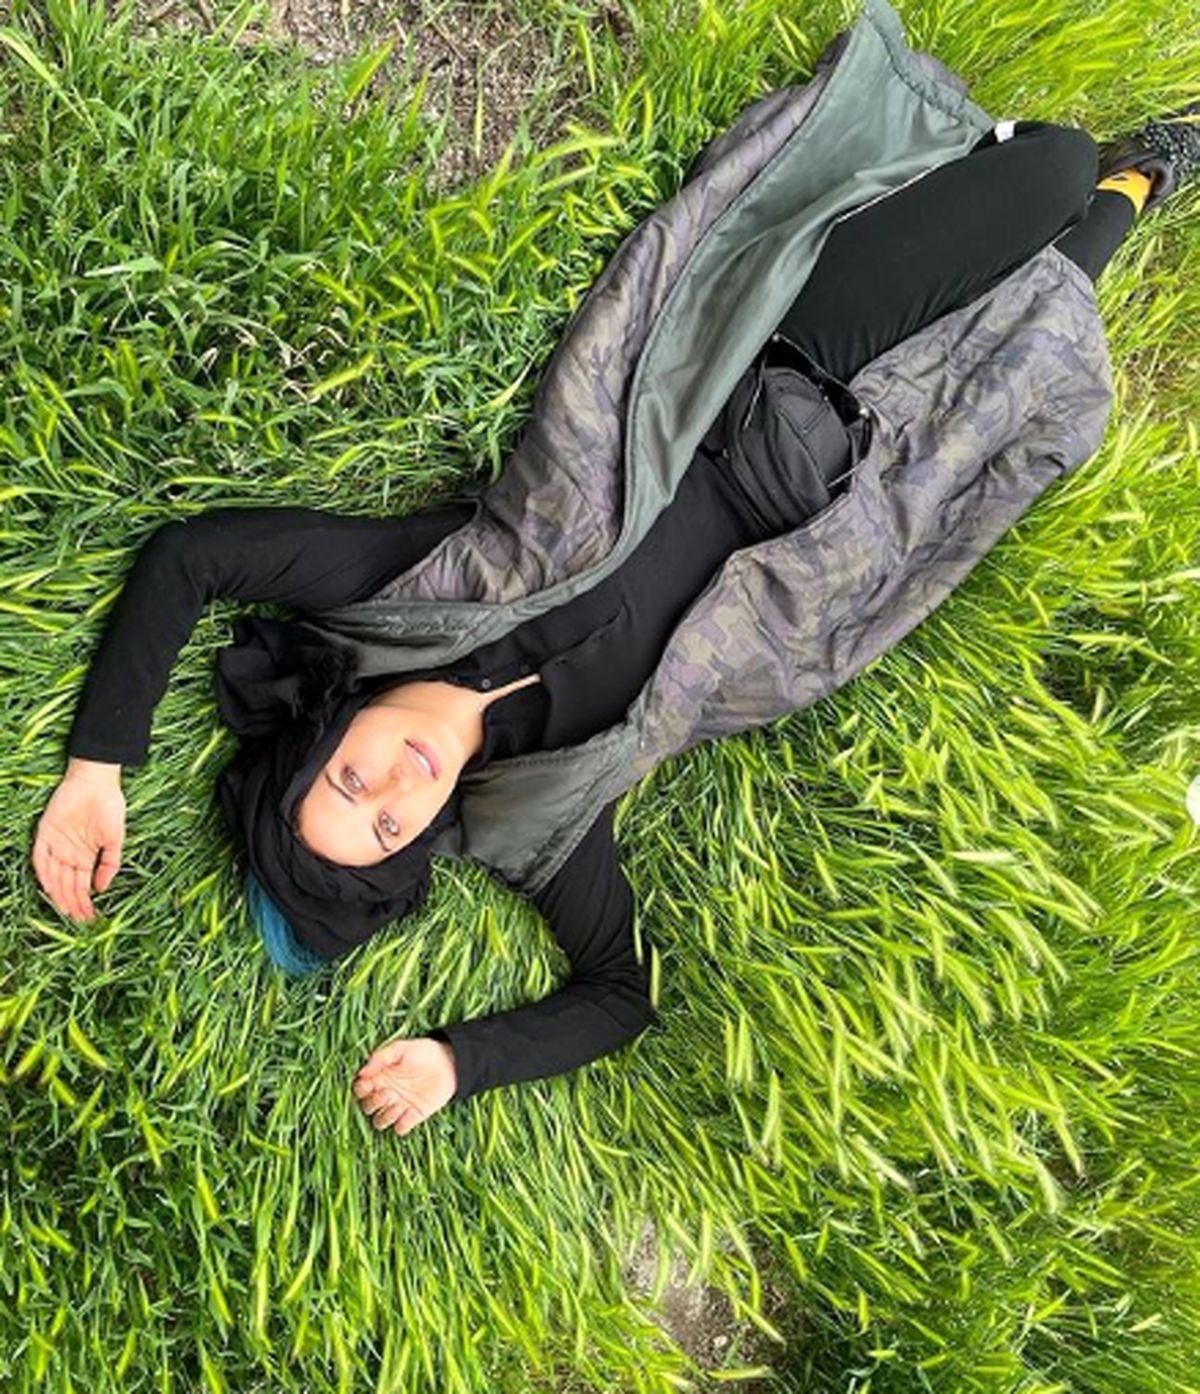 حرکت ناجور الناز شاکردوست بدون حجاب +عکس